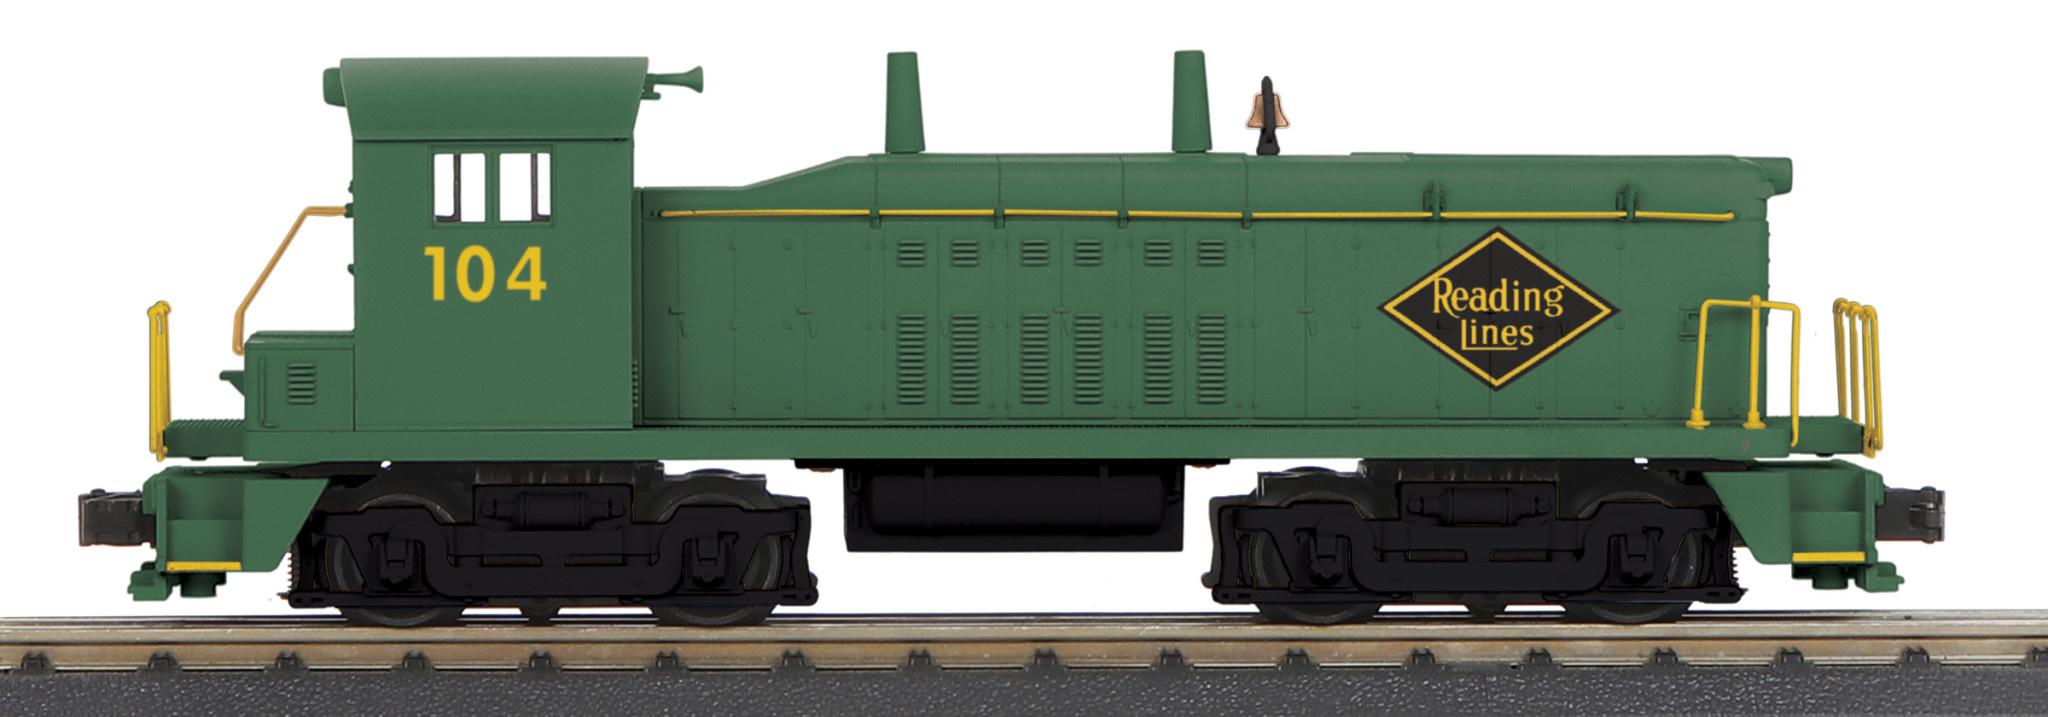 MTH - RailKing Reading NW-2 Switcher Diesel Engine W/ Proto-Sound 3.0